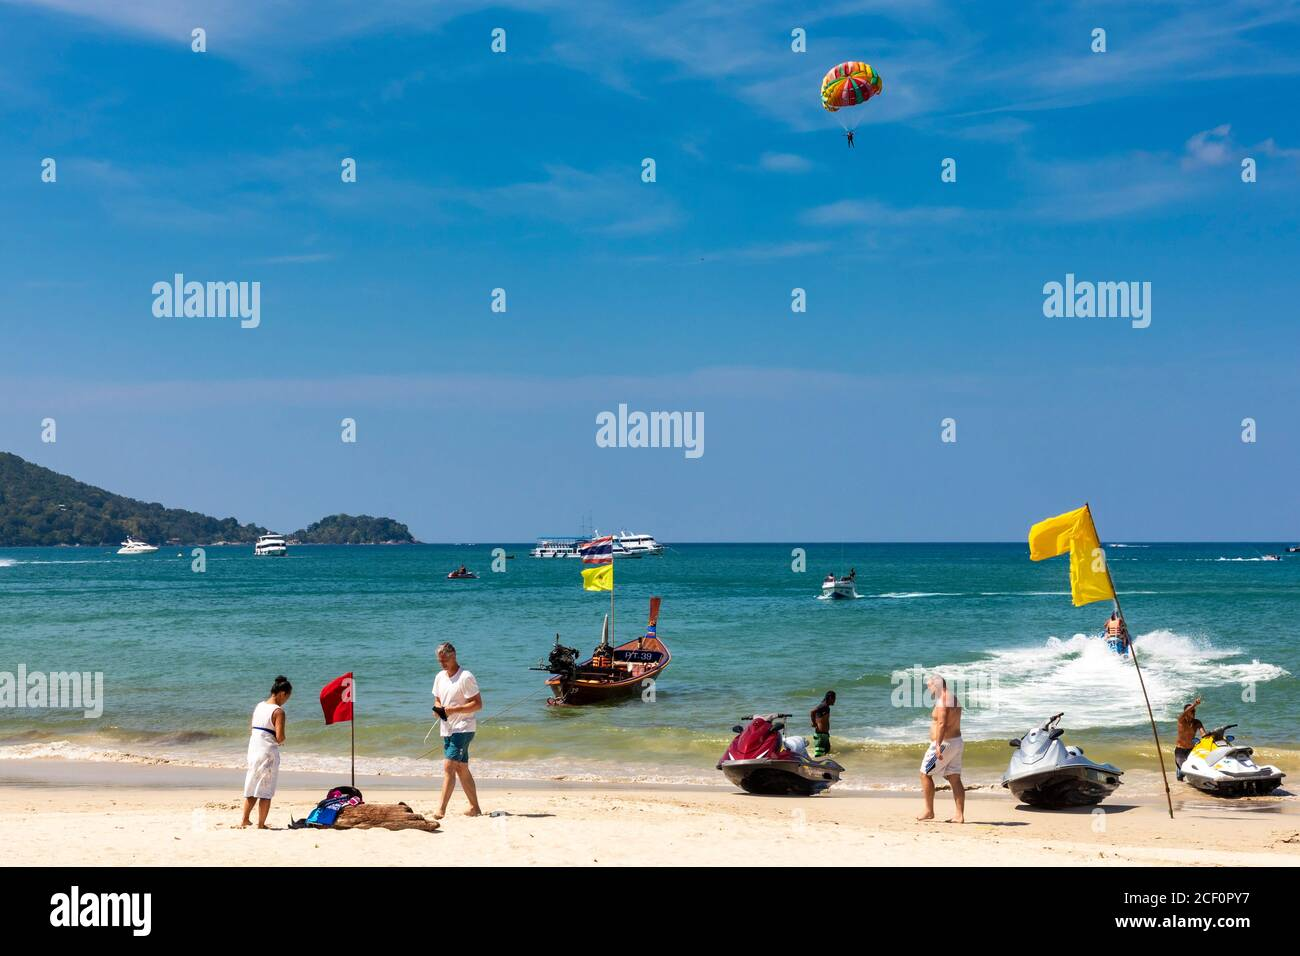 Parasailing sobre el mar, Patong Beach, Phuket, Tailandia Foto de stock